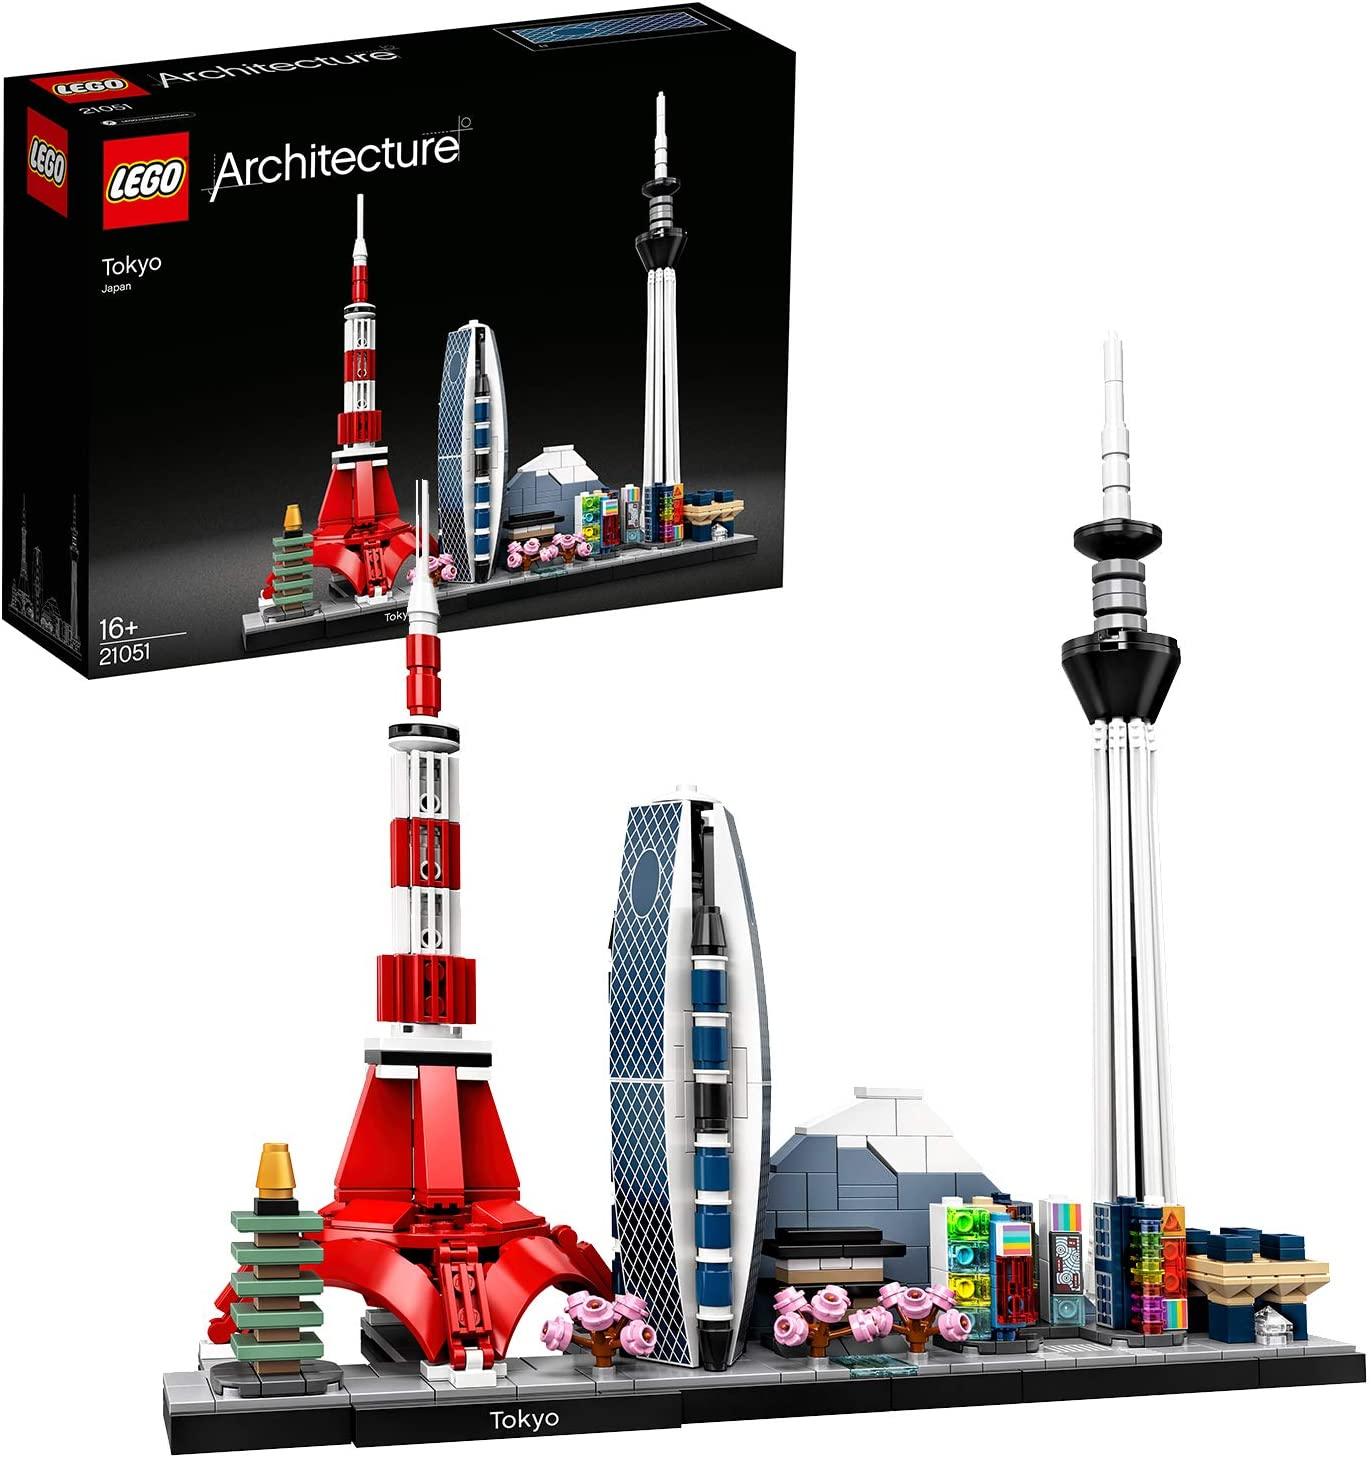 LEGO 21051 Architecture Tokio Model Bouwset, Skyline collectie